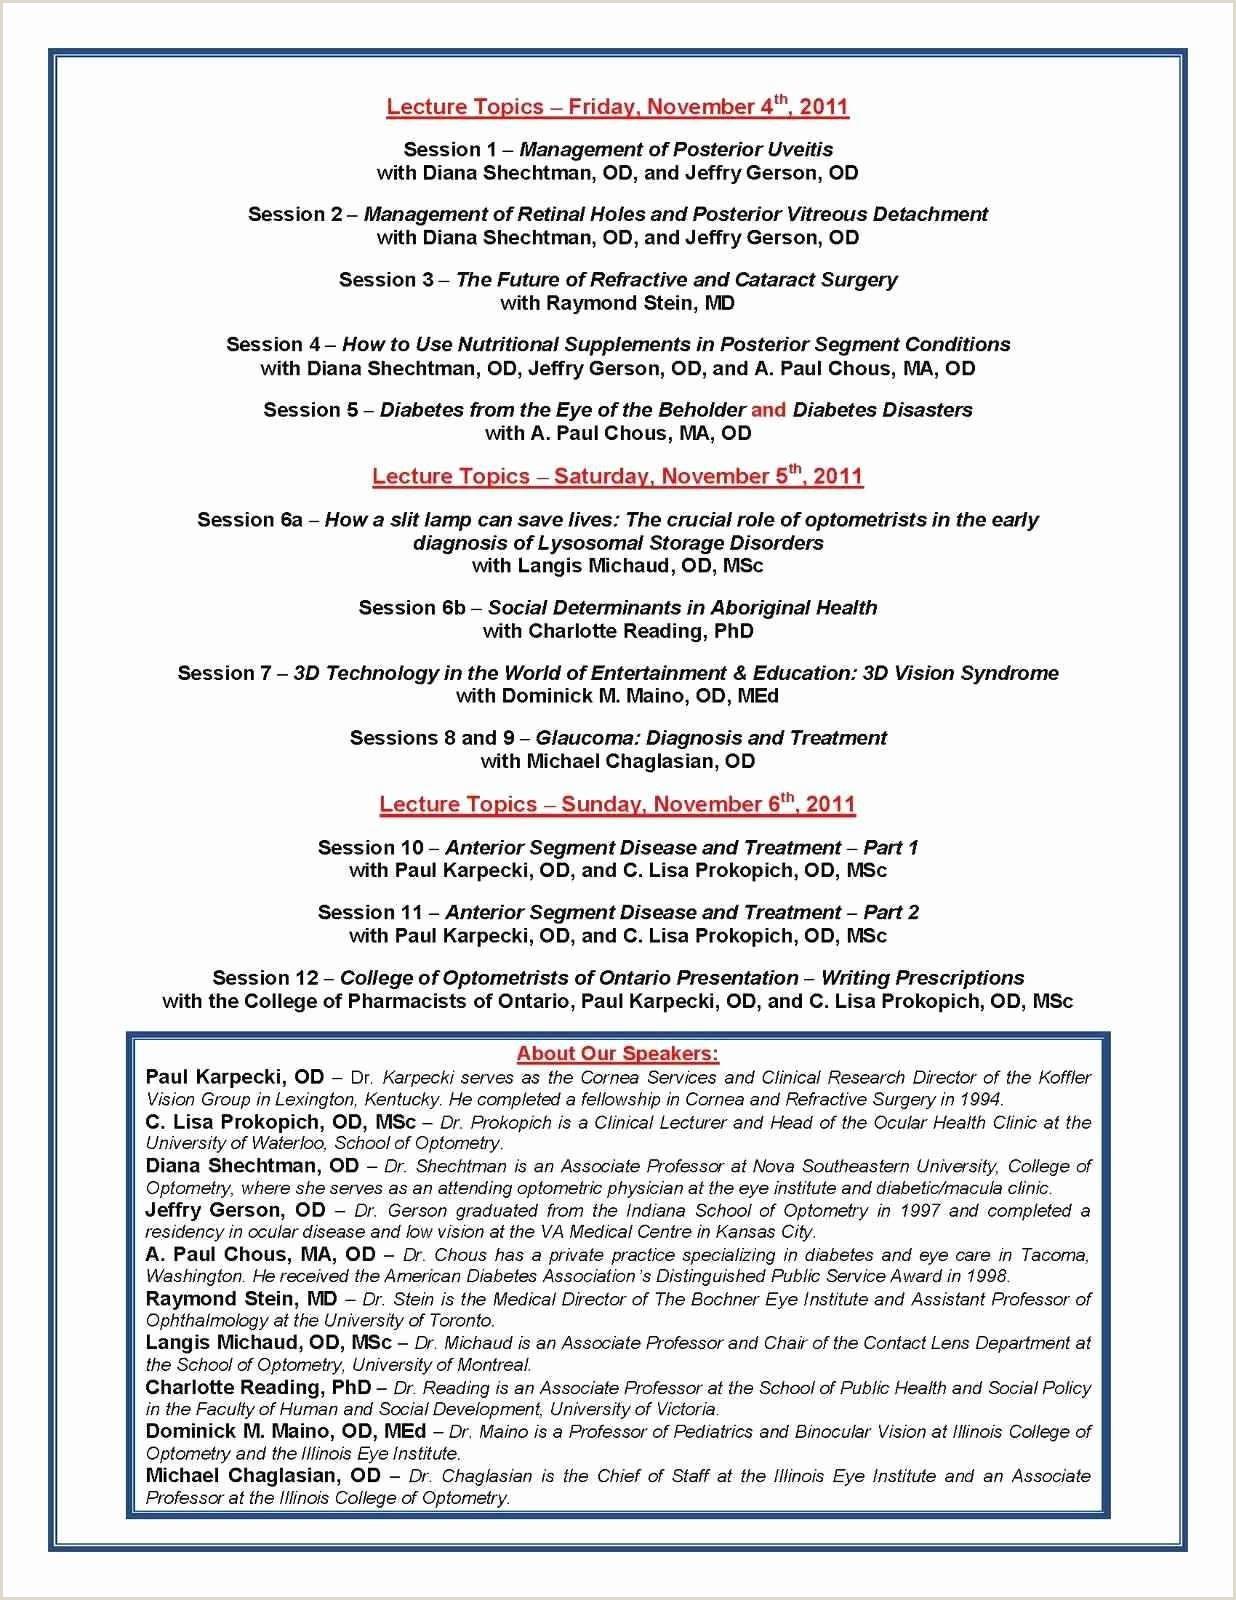 Curriculum Vitae formato Word Para Rellenar Gratis 2018 formato De Diplomas Para Llenar